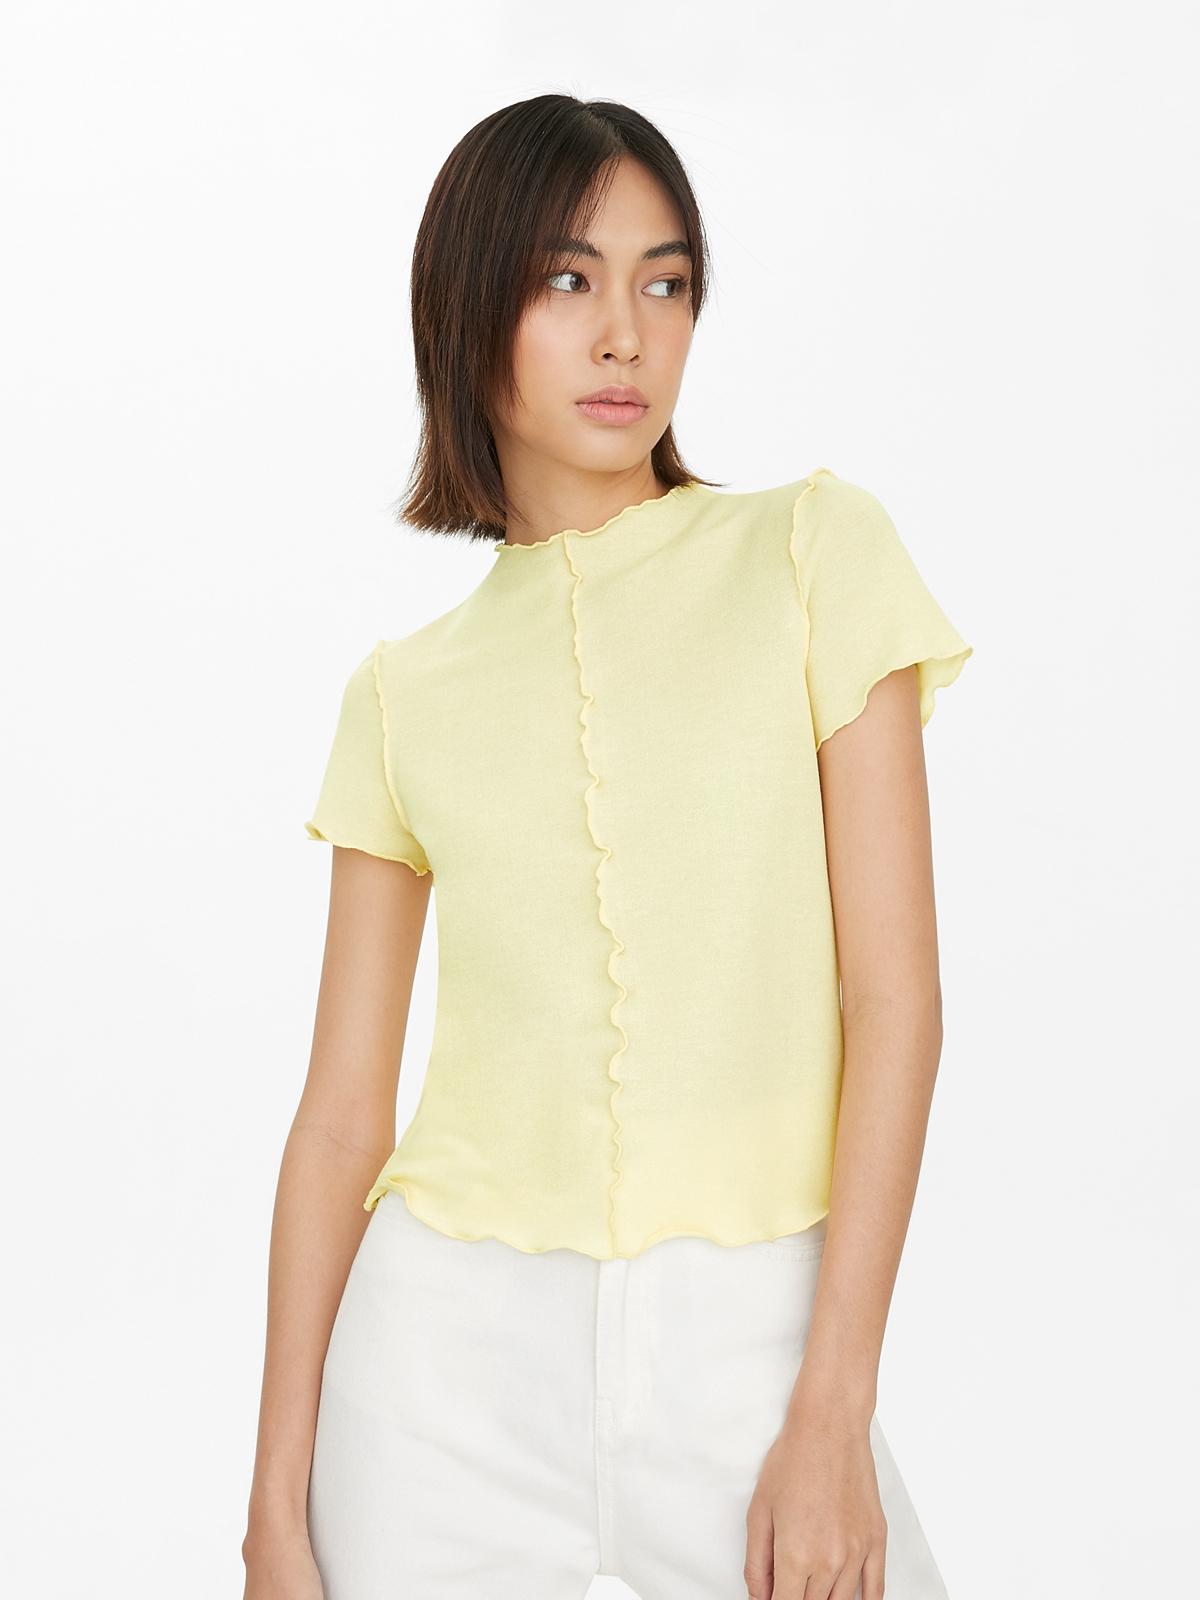 Center Seam Trimmed Short Sleeve Tee Yellow